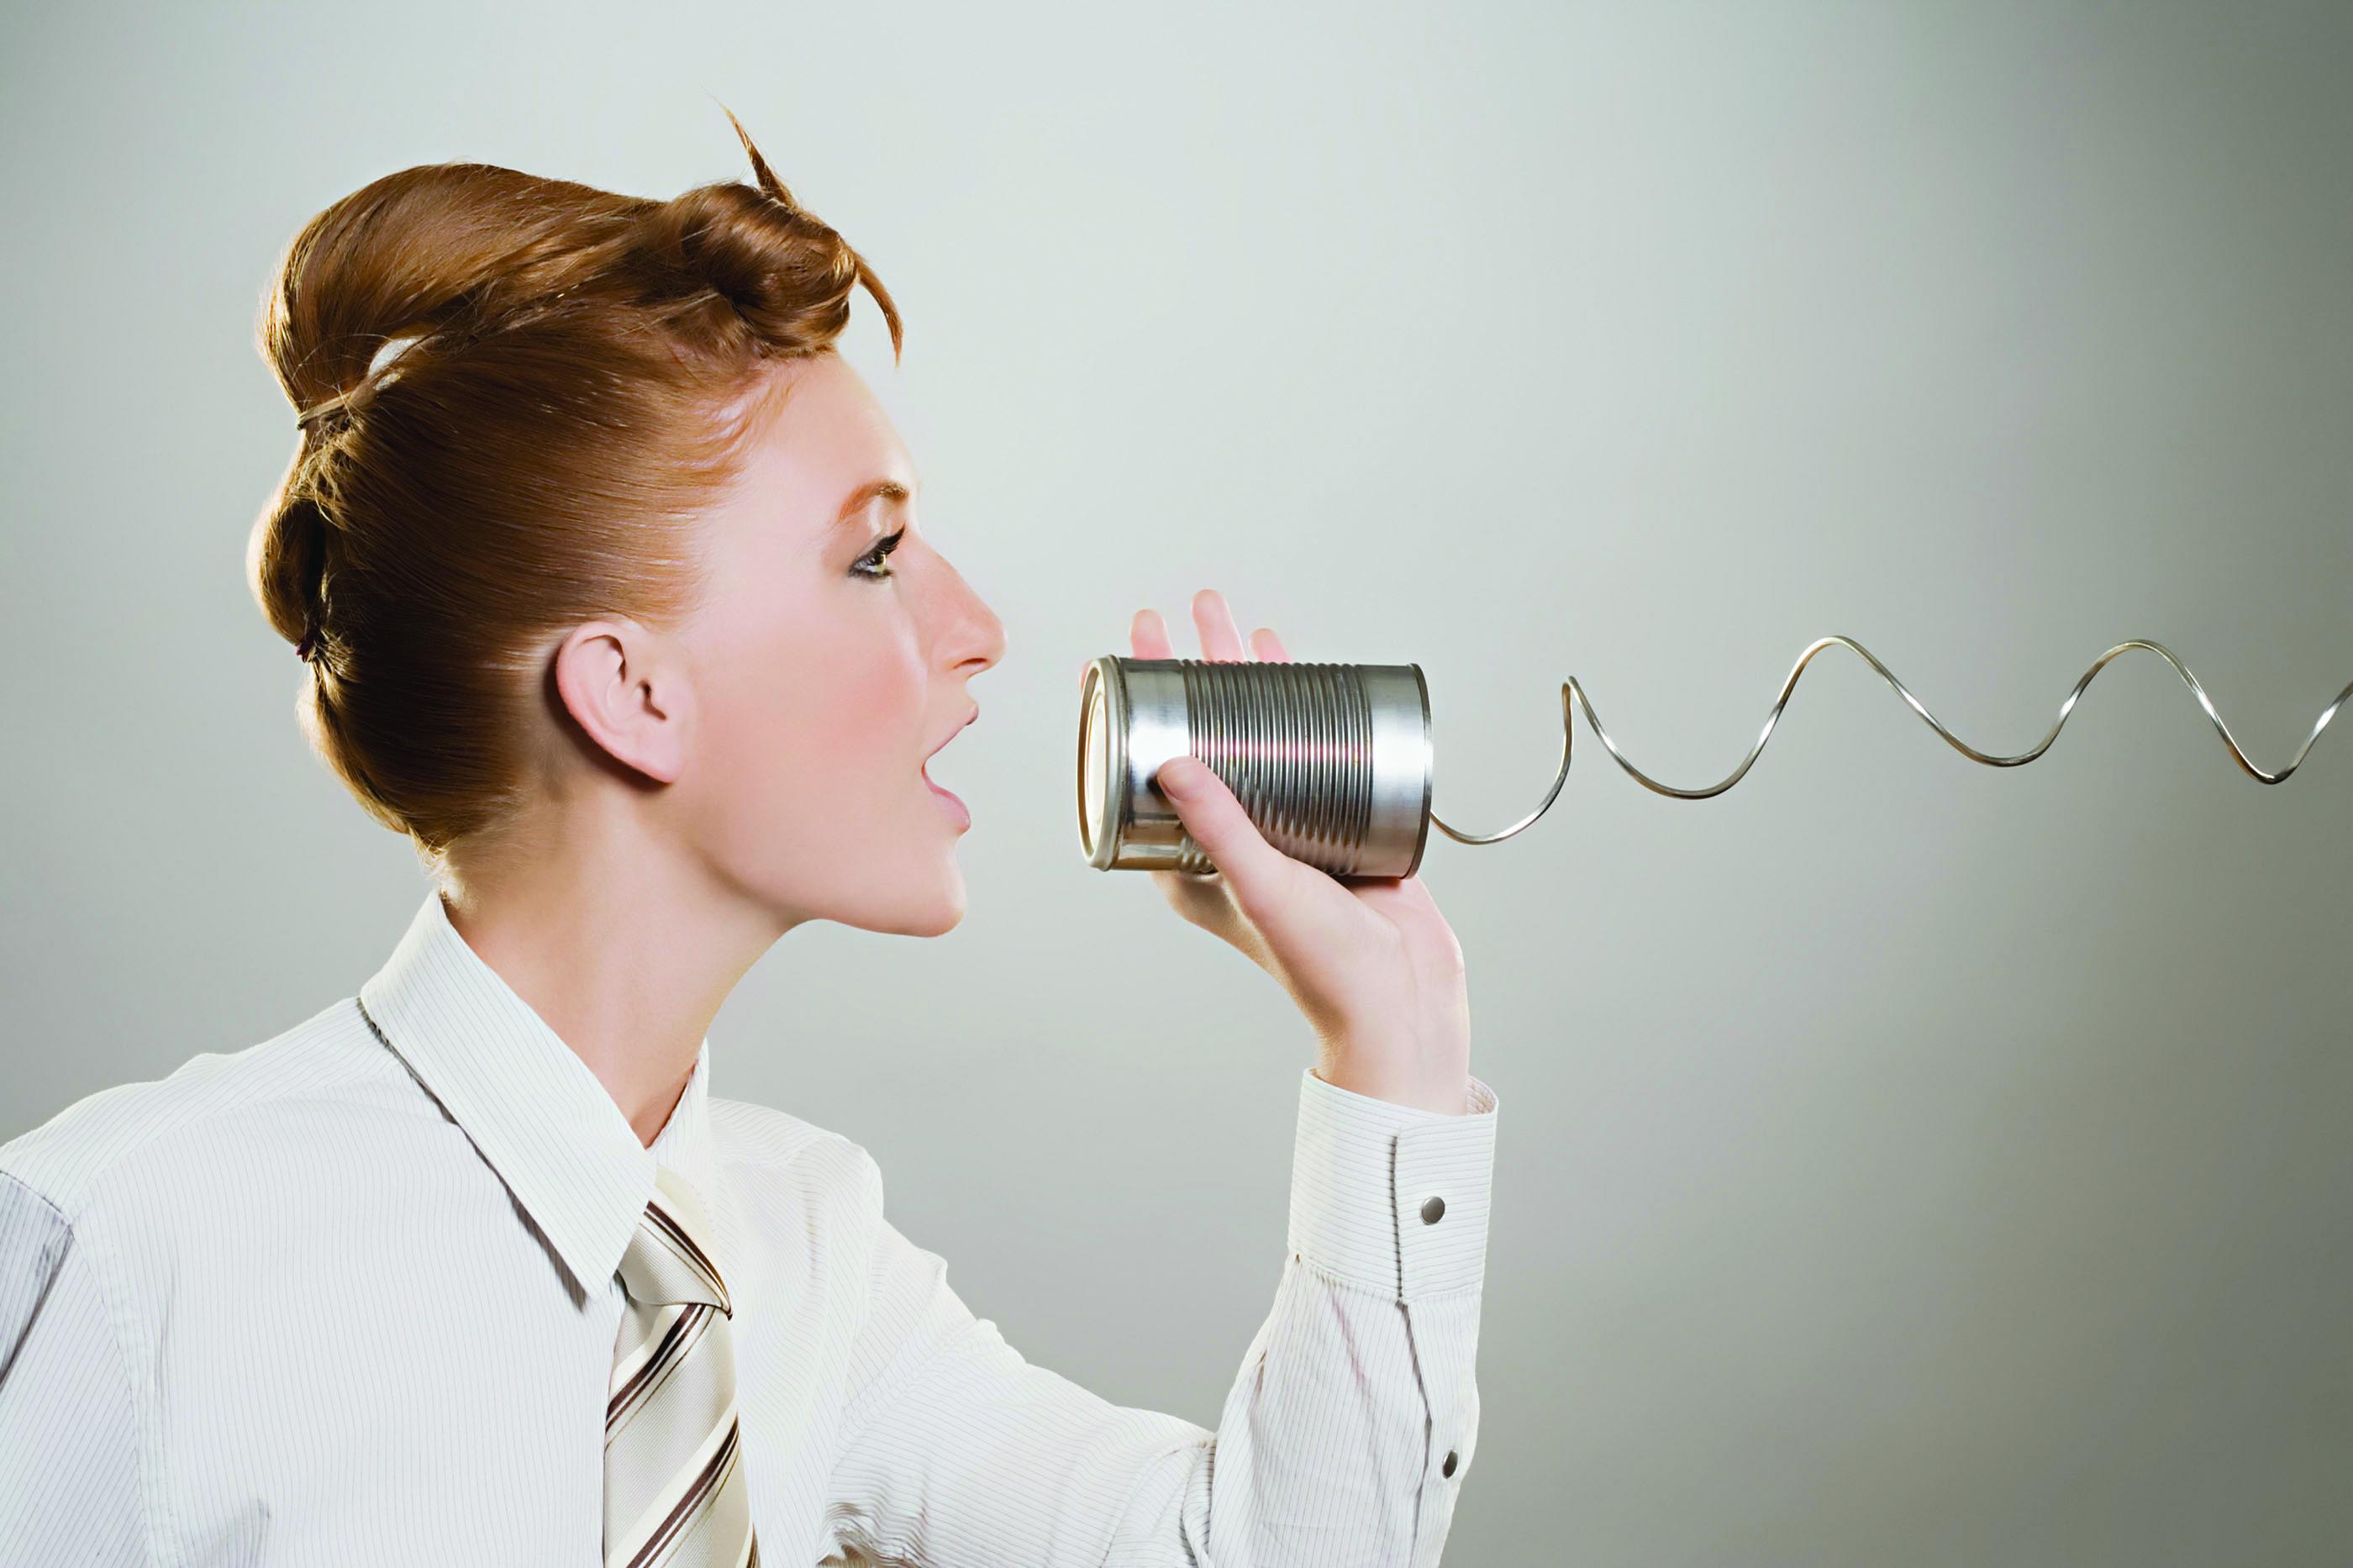 tin-can-phone.jpg